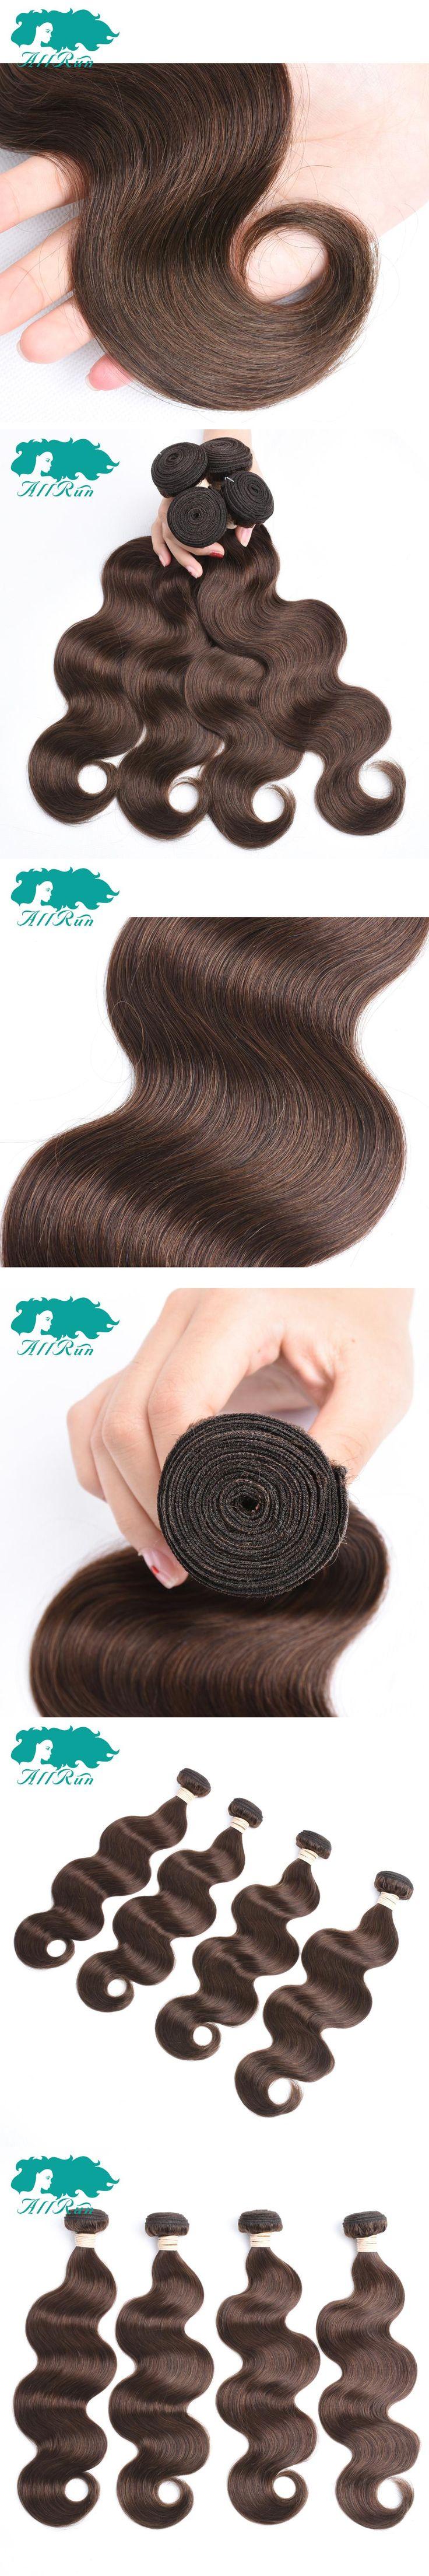 Allrun Pre-Colored Malaysian Body Wave 4# Light Brown Malaysian Hair Weave Bundles 4pc/lot 100% Human Hair Free Shipping